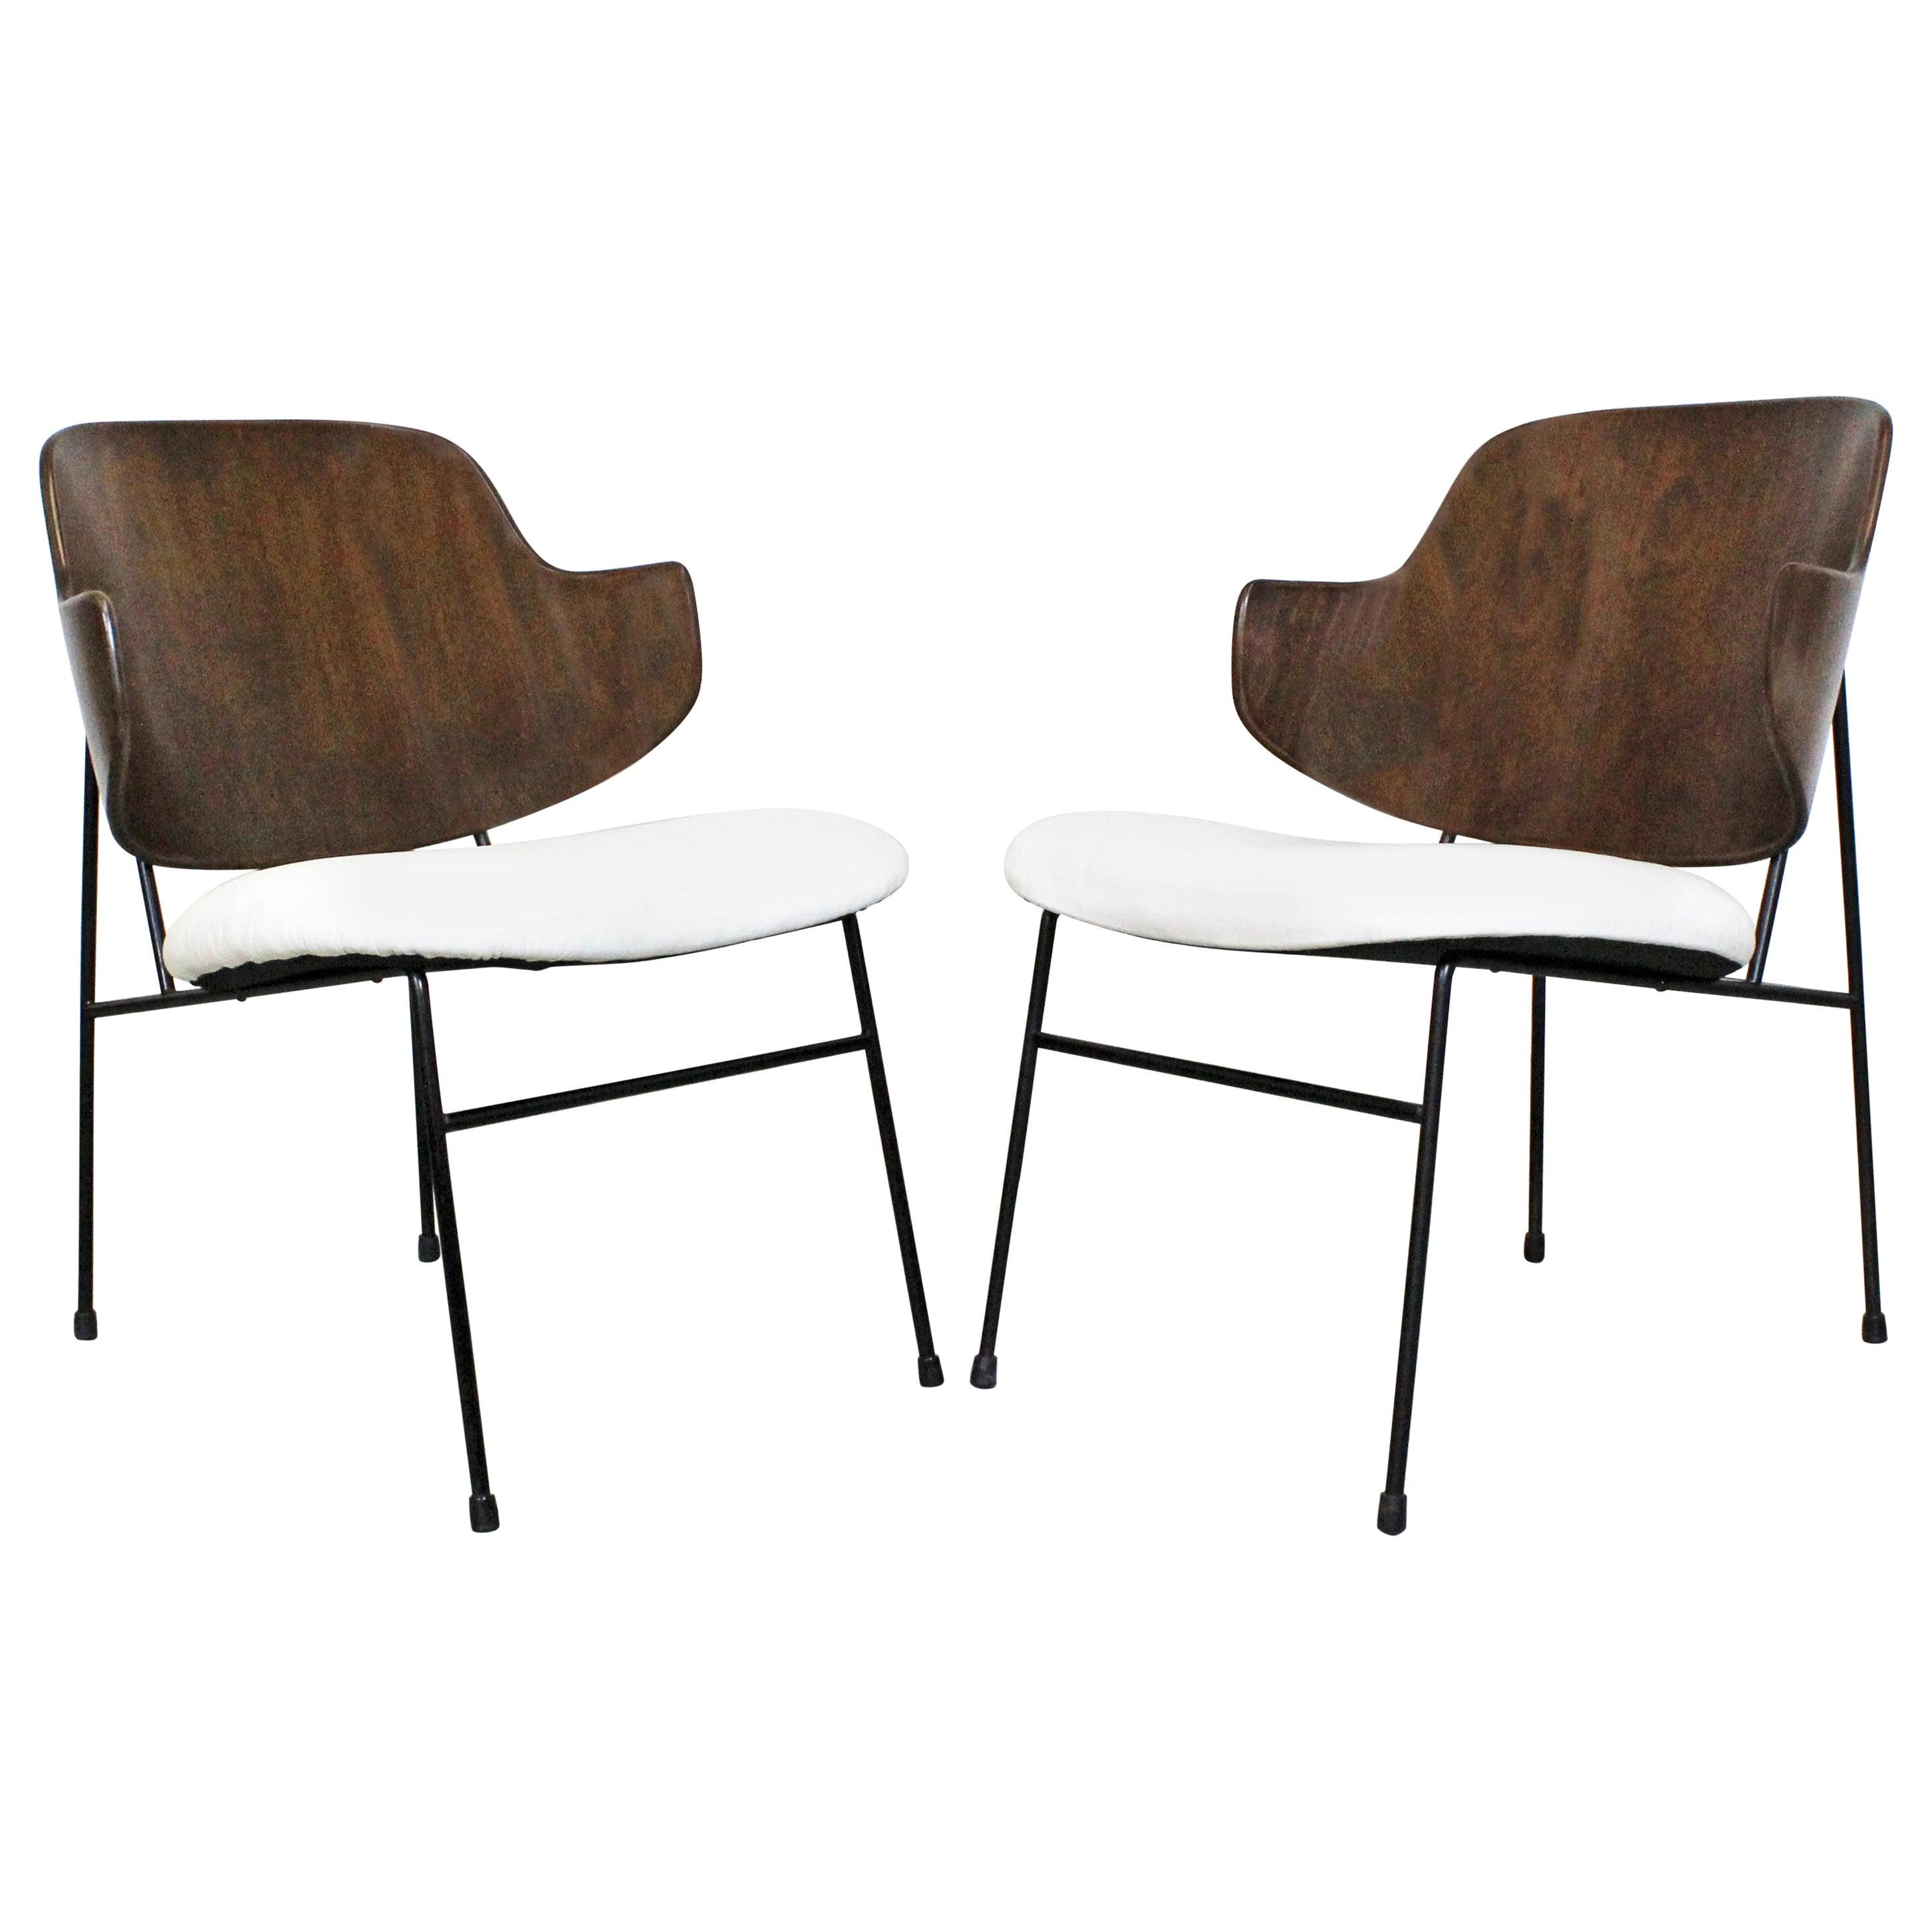 Pair of Midcentury Danish Modern IB Kofod Larsen Selig Penguin Chairs